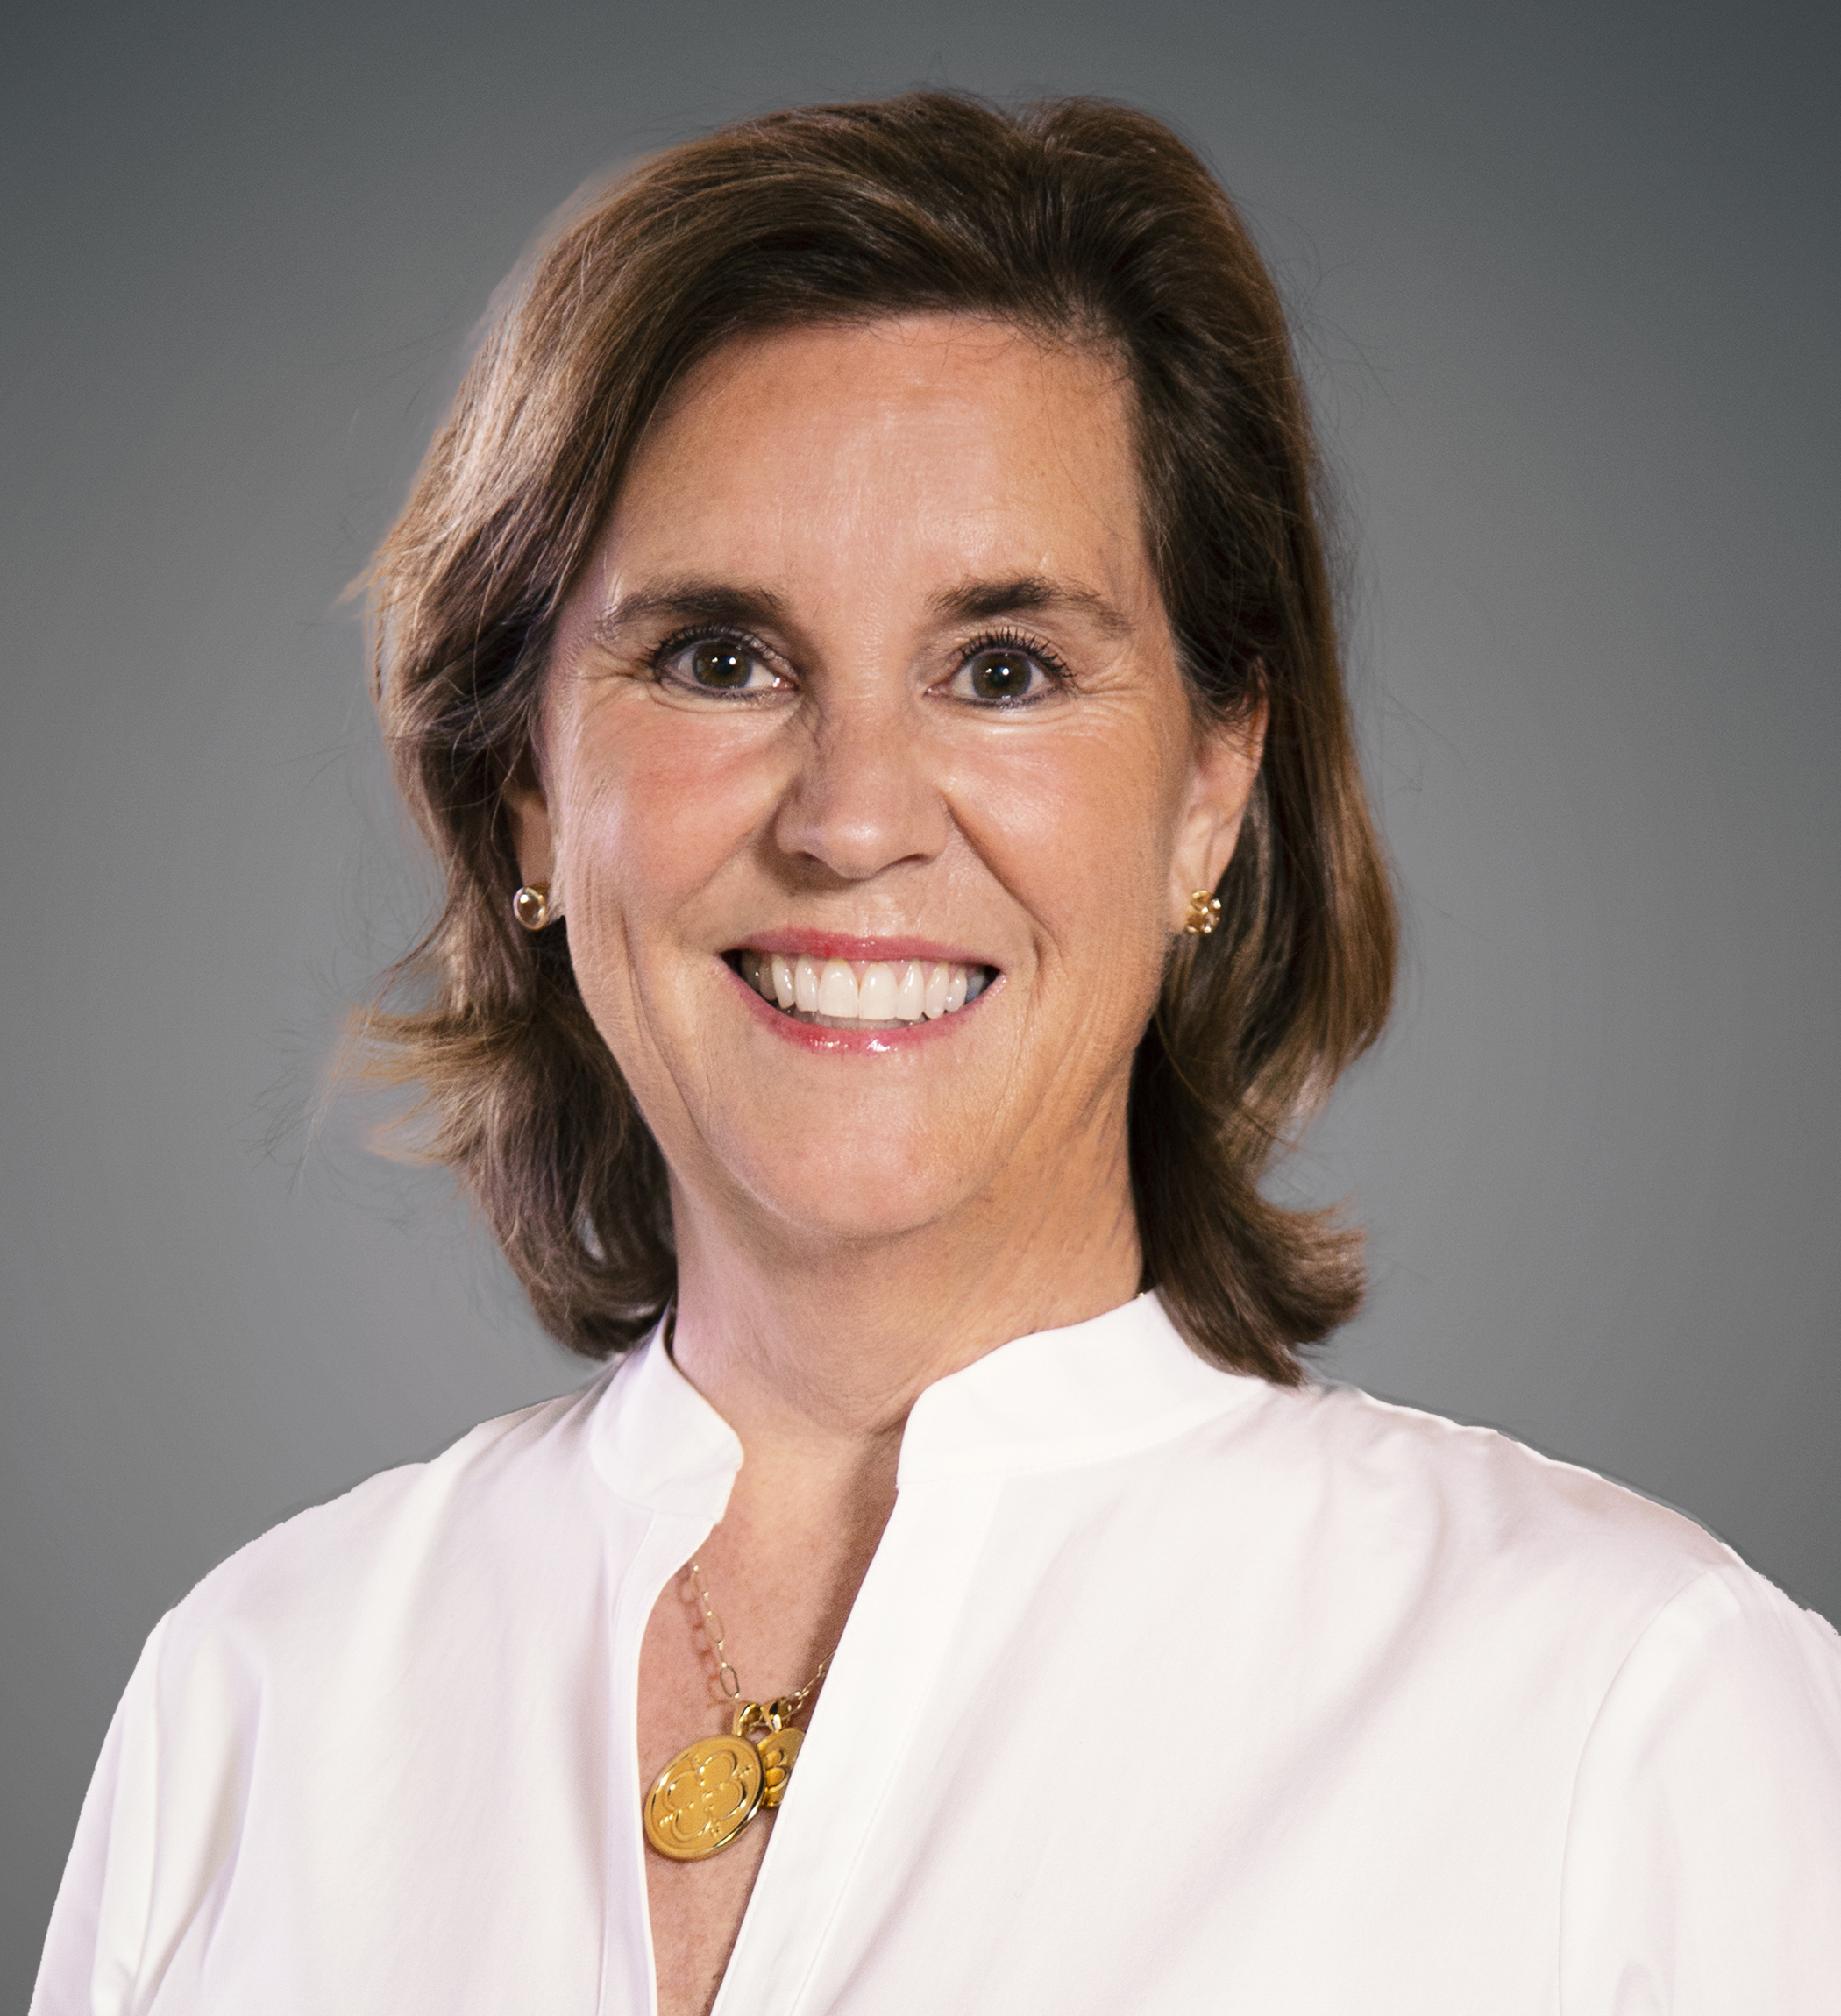 Barbara Loeslein Headshot | Dakota Investments